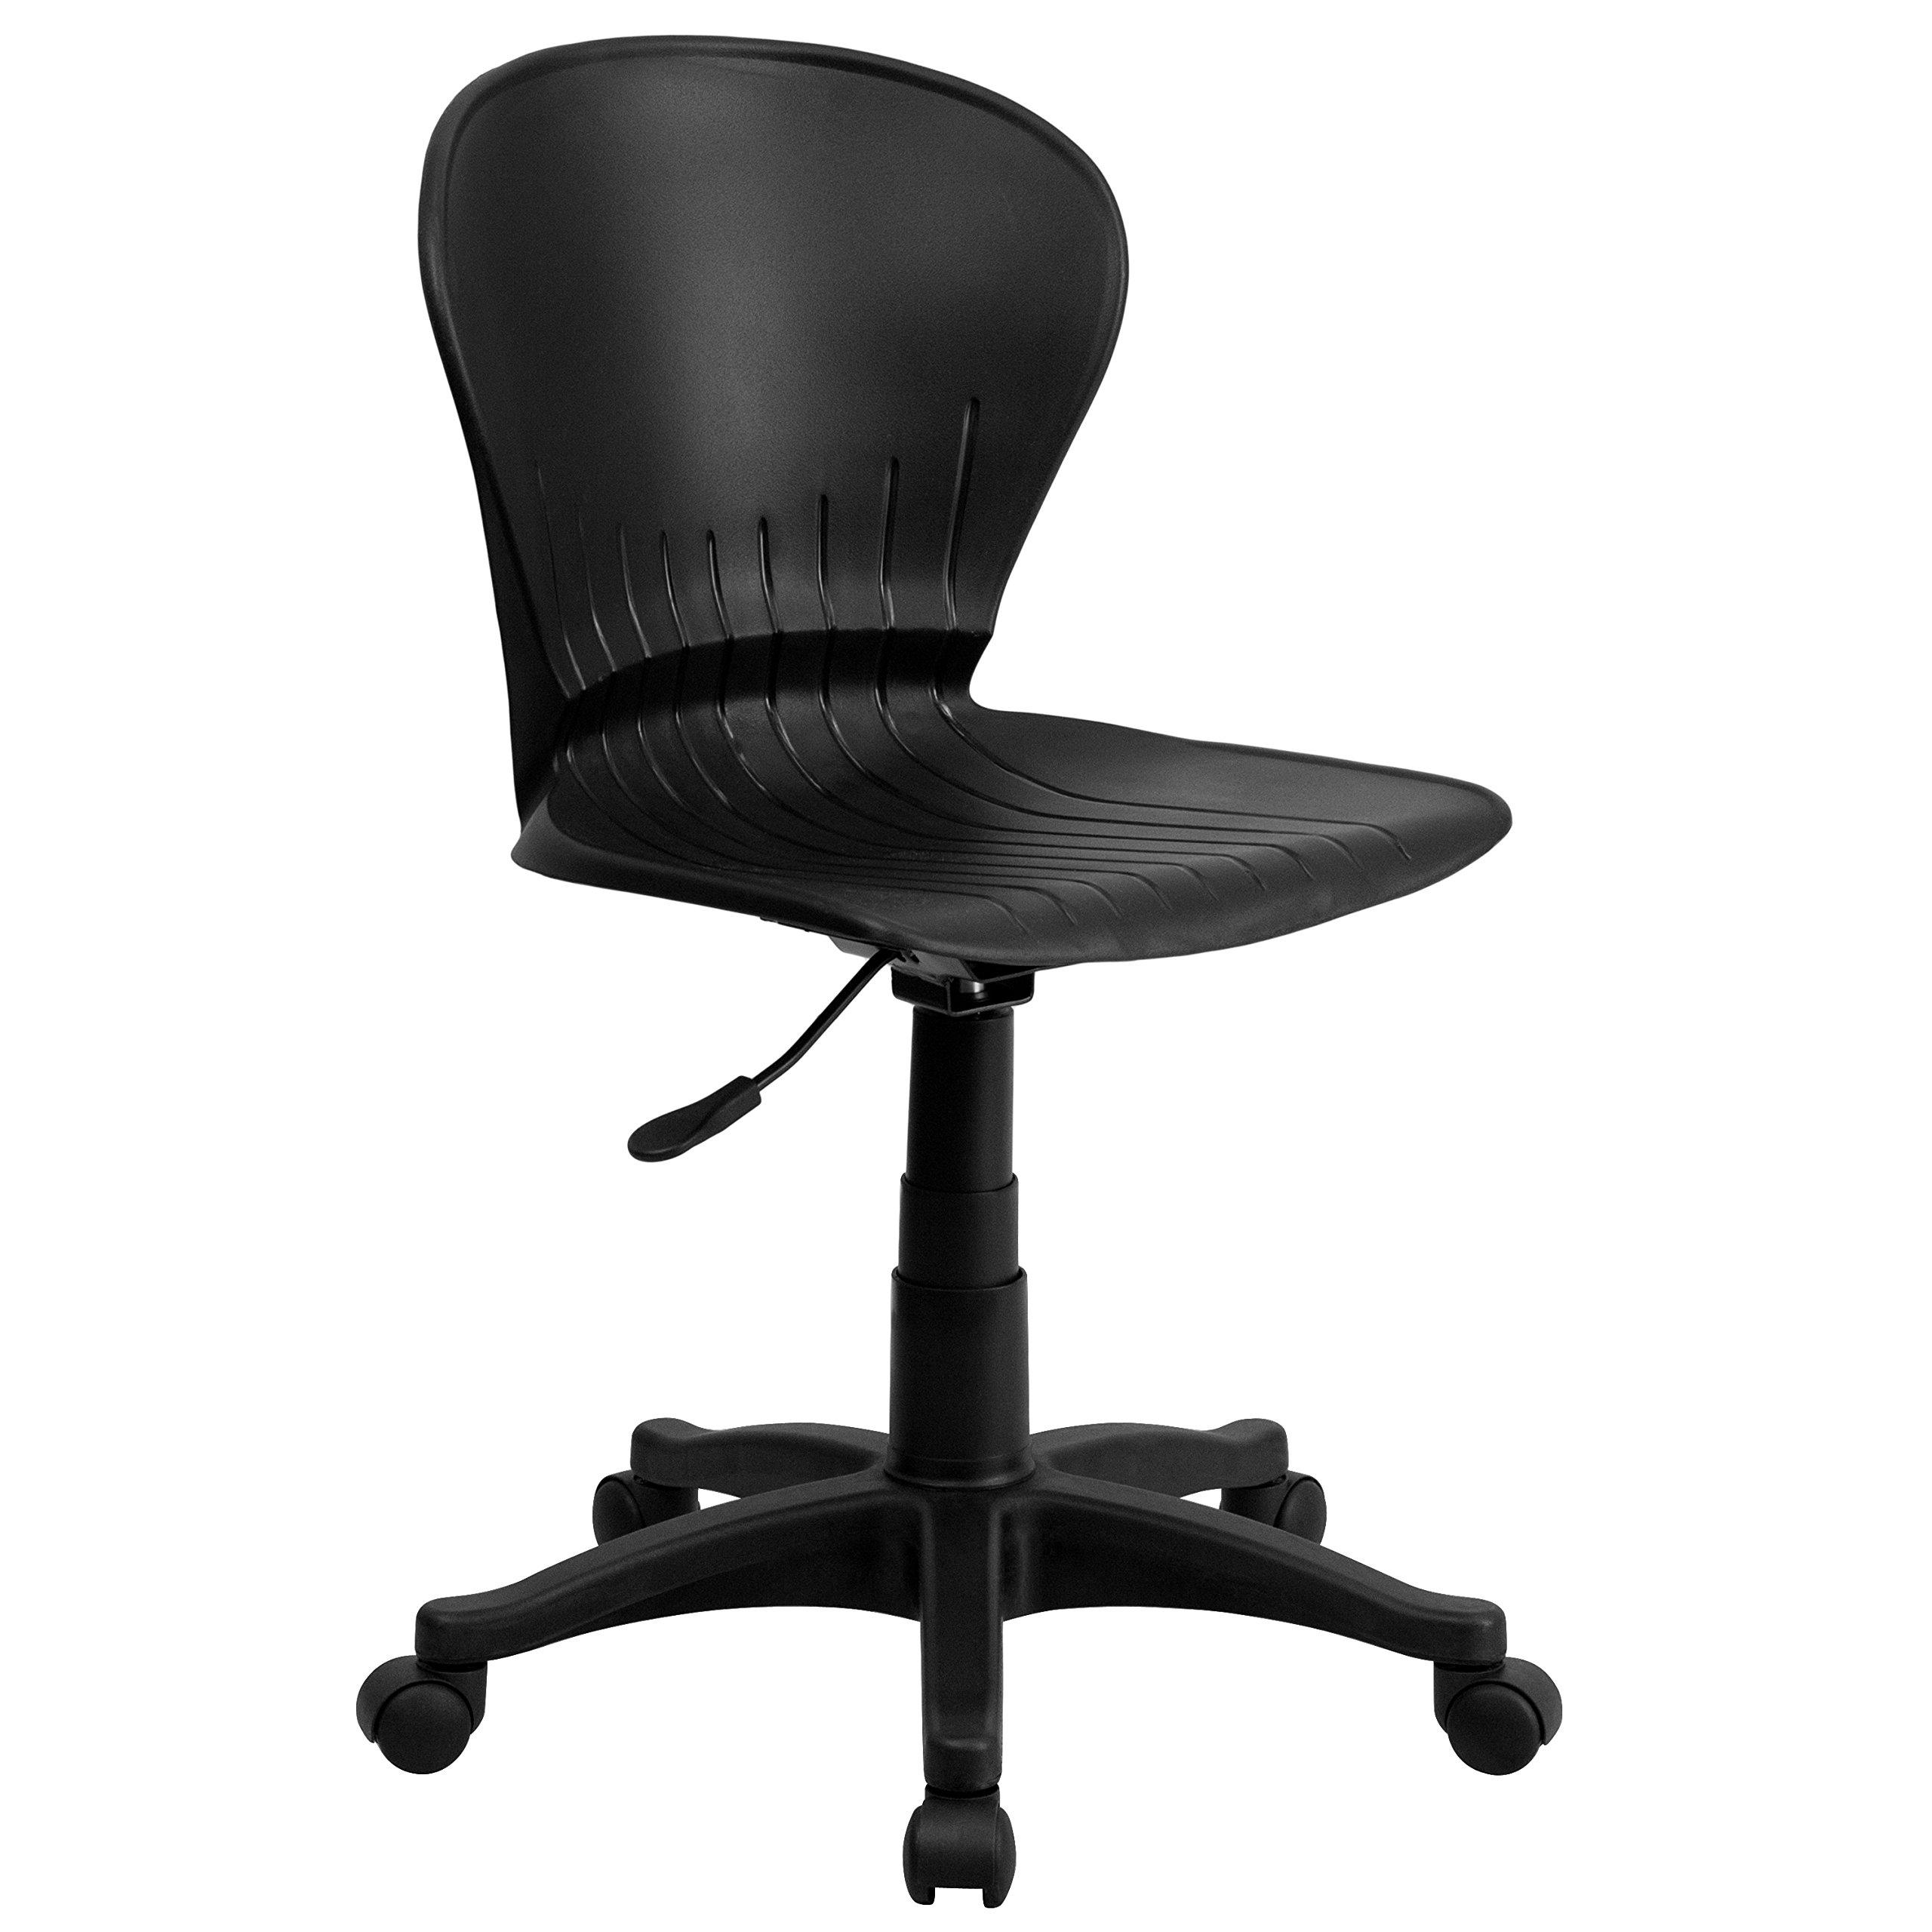 Plastic Swivel Chairs 2